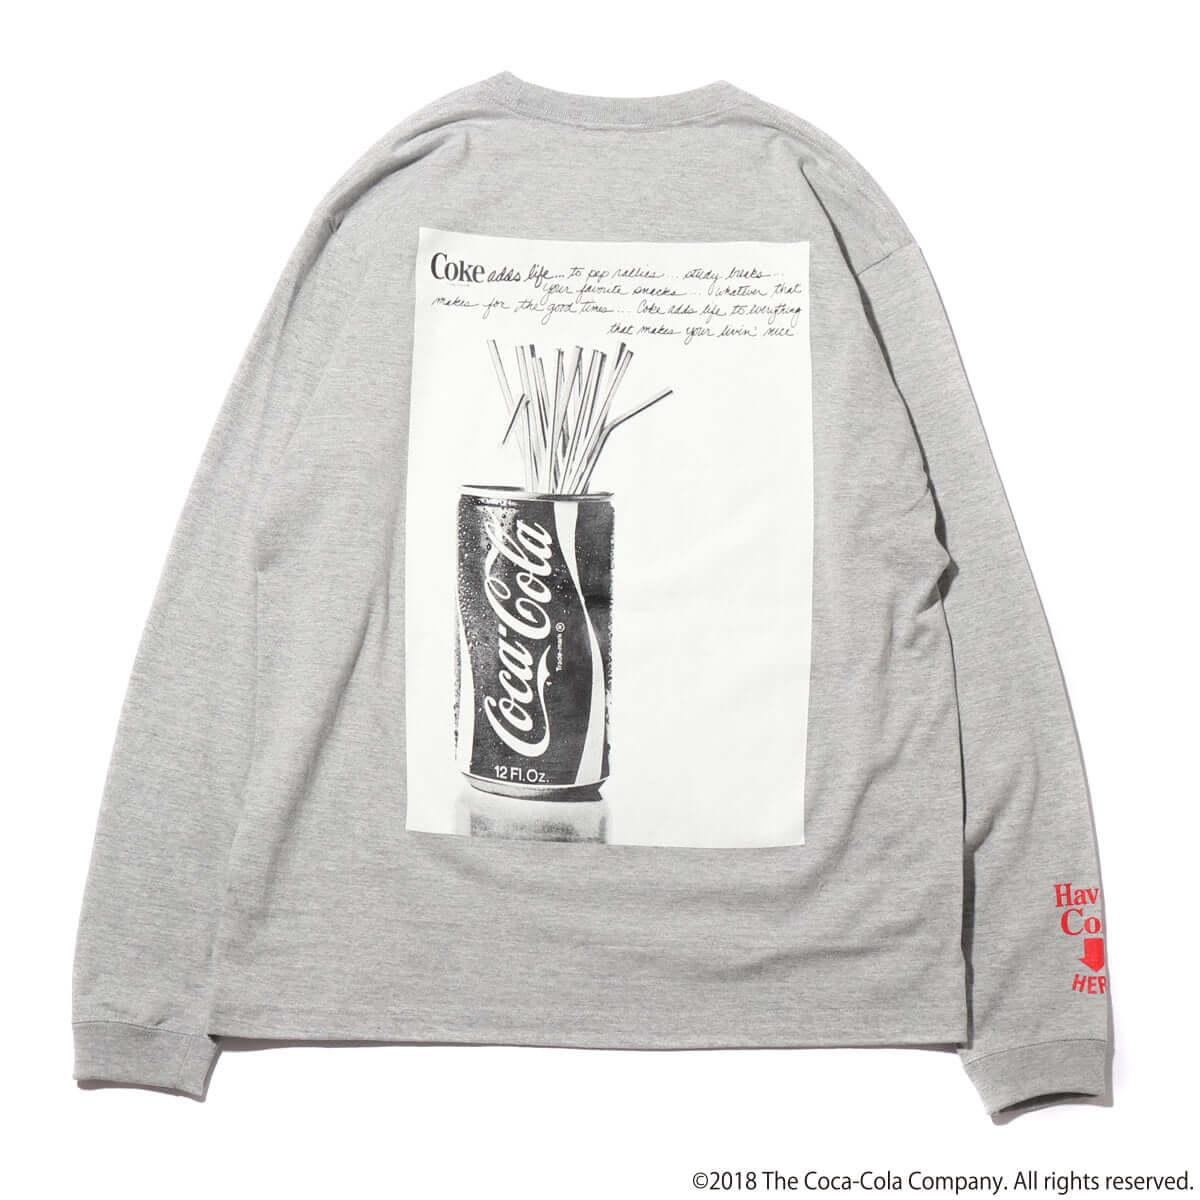 Coca-Cola×Billionaire Boys Club×ATMOS LAB トリプルコラボレーションアイテムが発売 greylstee1-2c-1200x1200